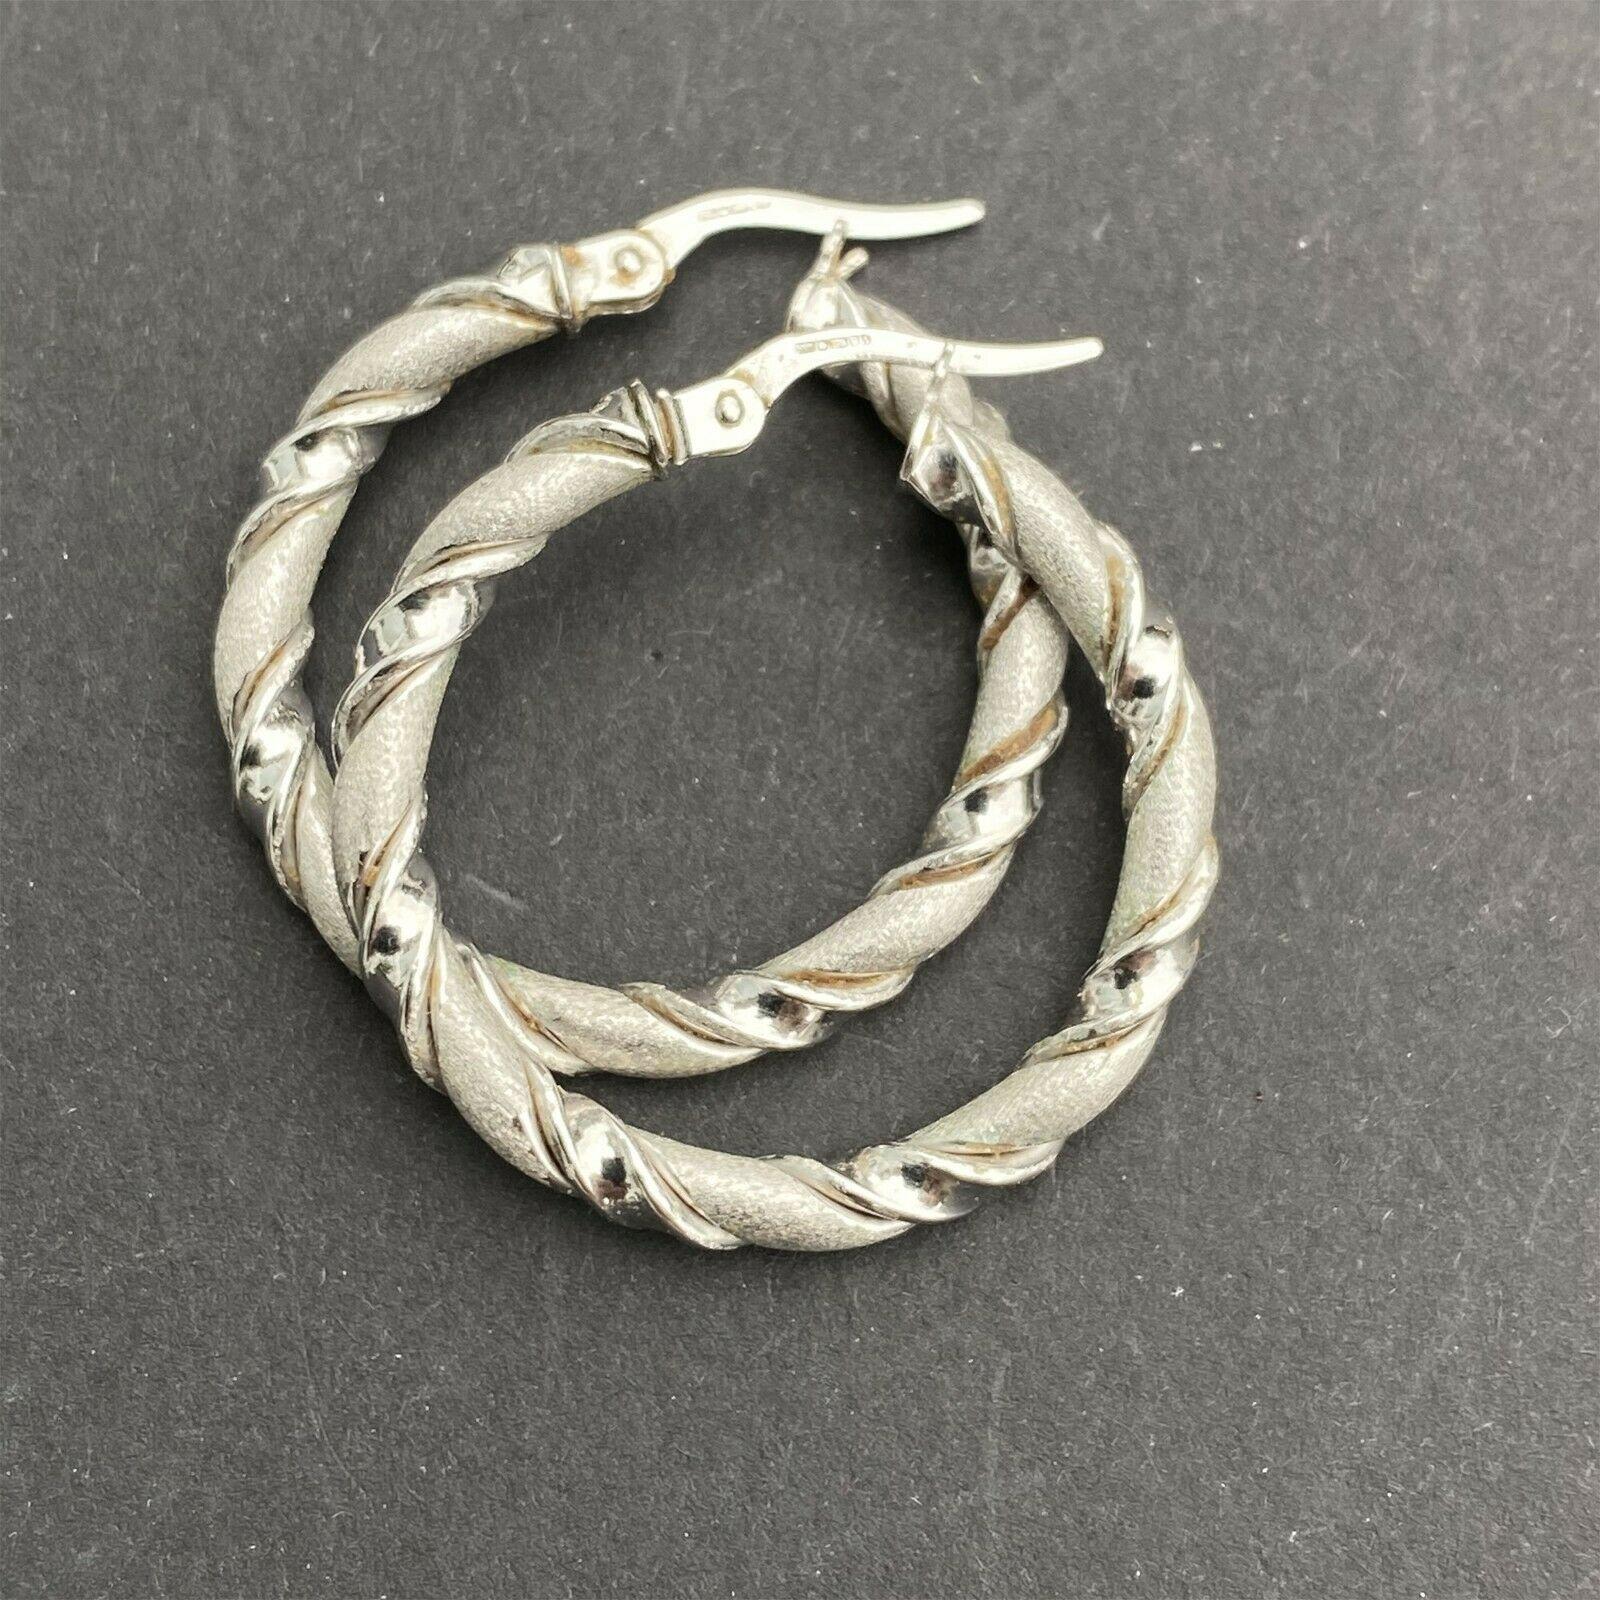 Fabulous, 9ct, 9k, 375 White Gold, twist rope, hoop Earrings, 27.5mm